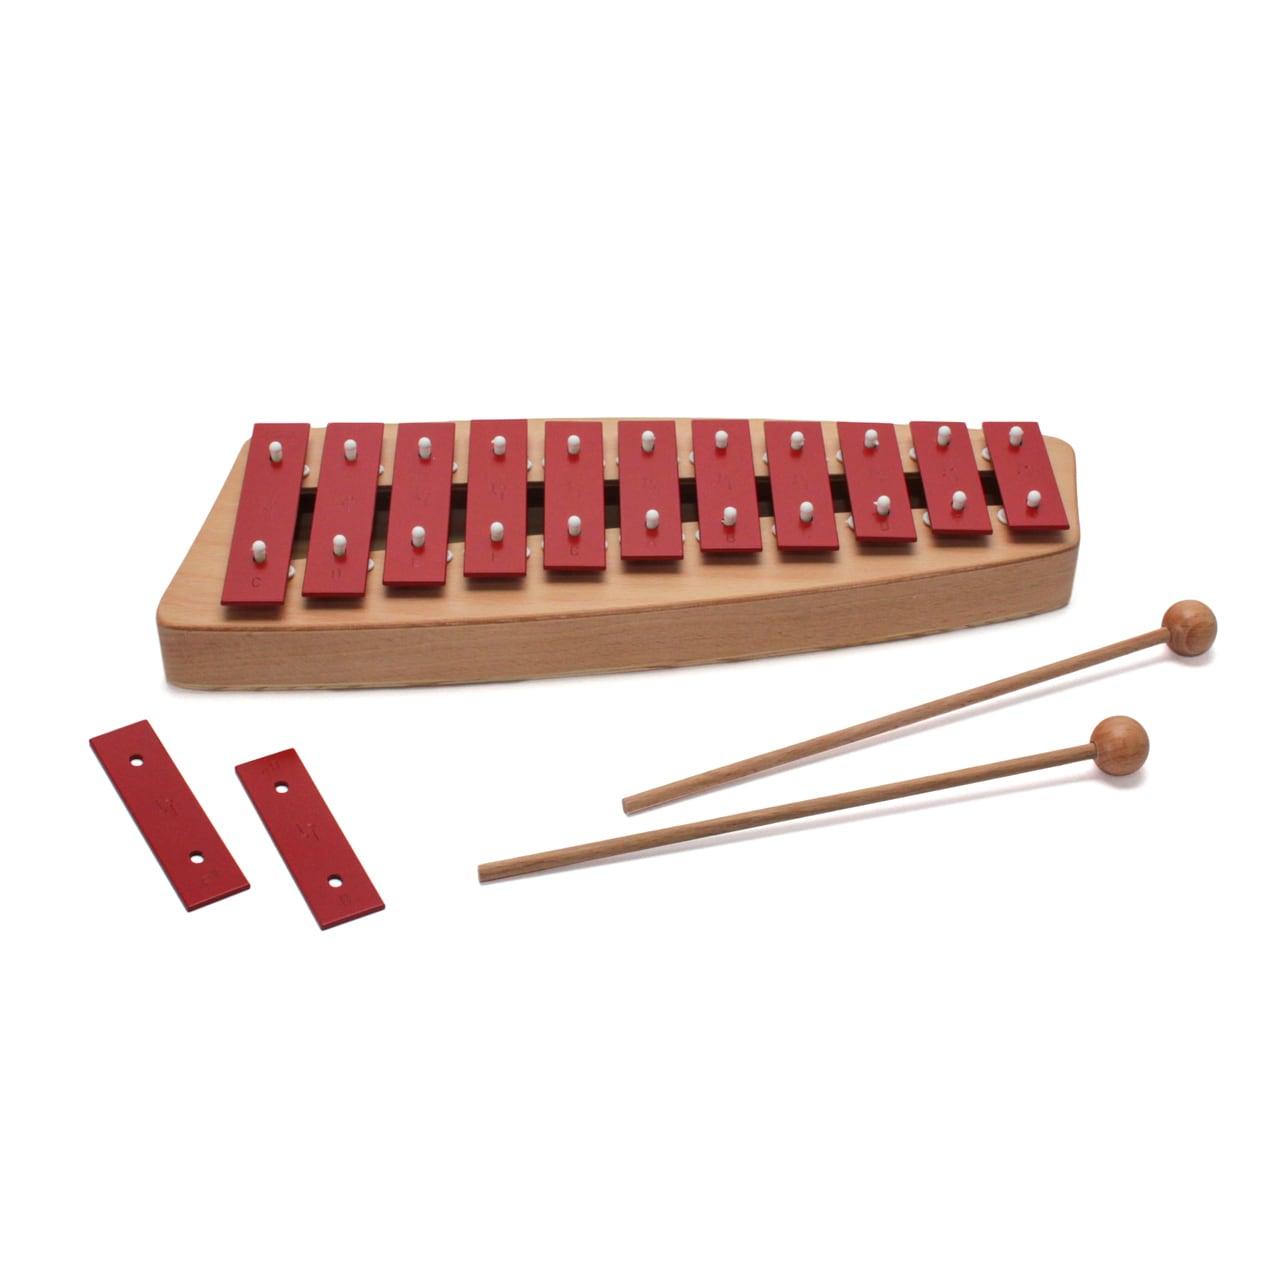 SONOR Soprano Glockenspiel メタルフォン